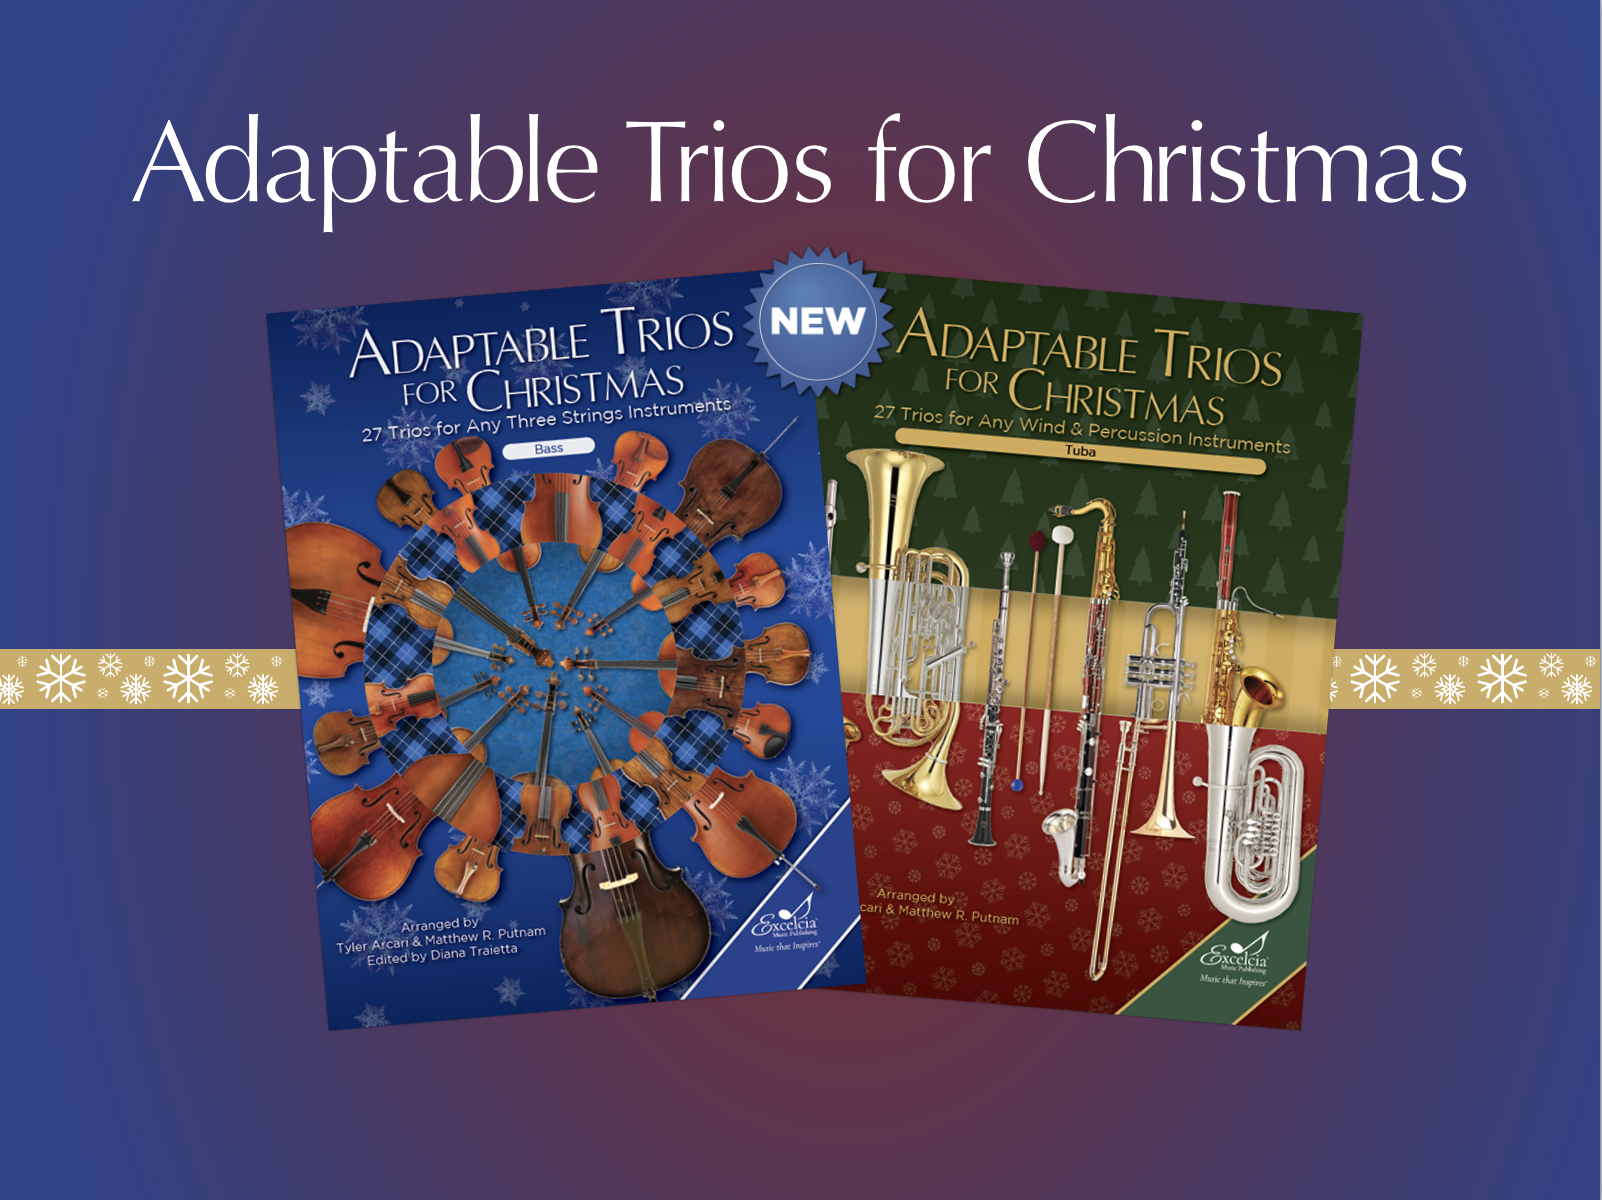 Adaptable Trios for Christmas